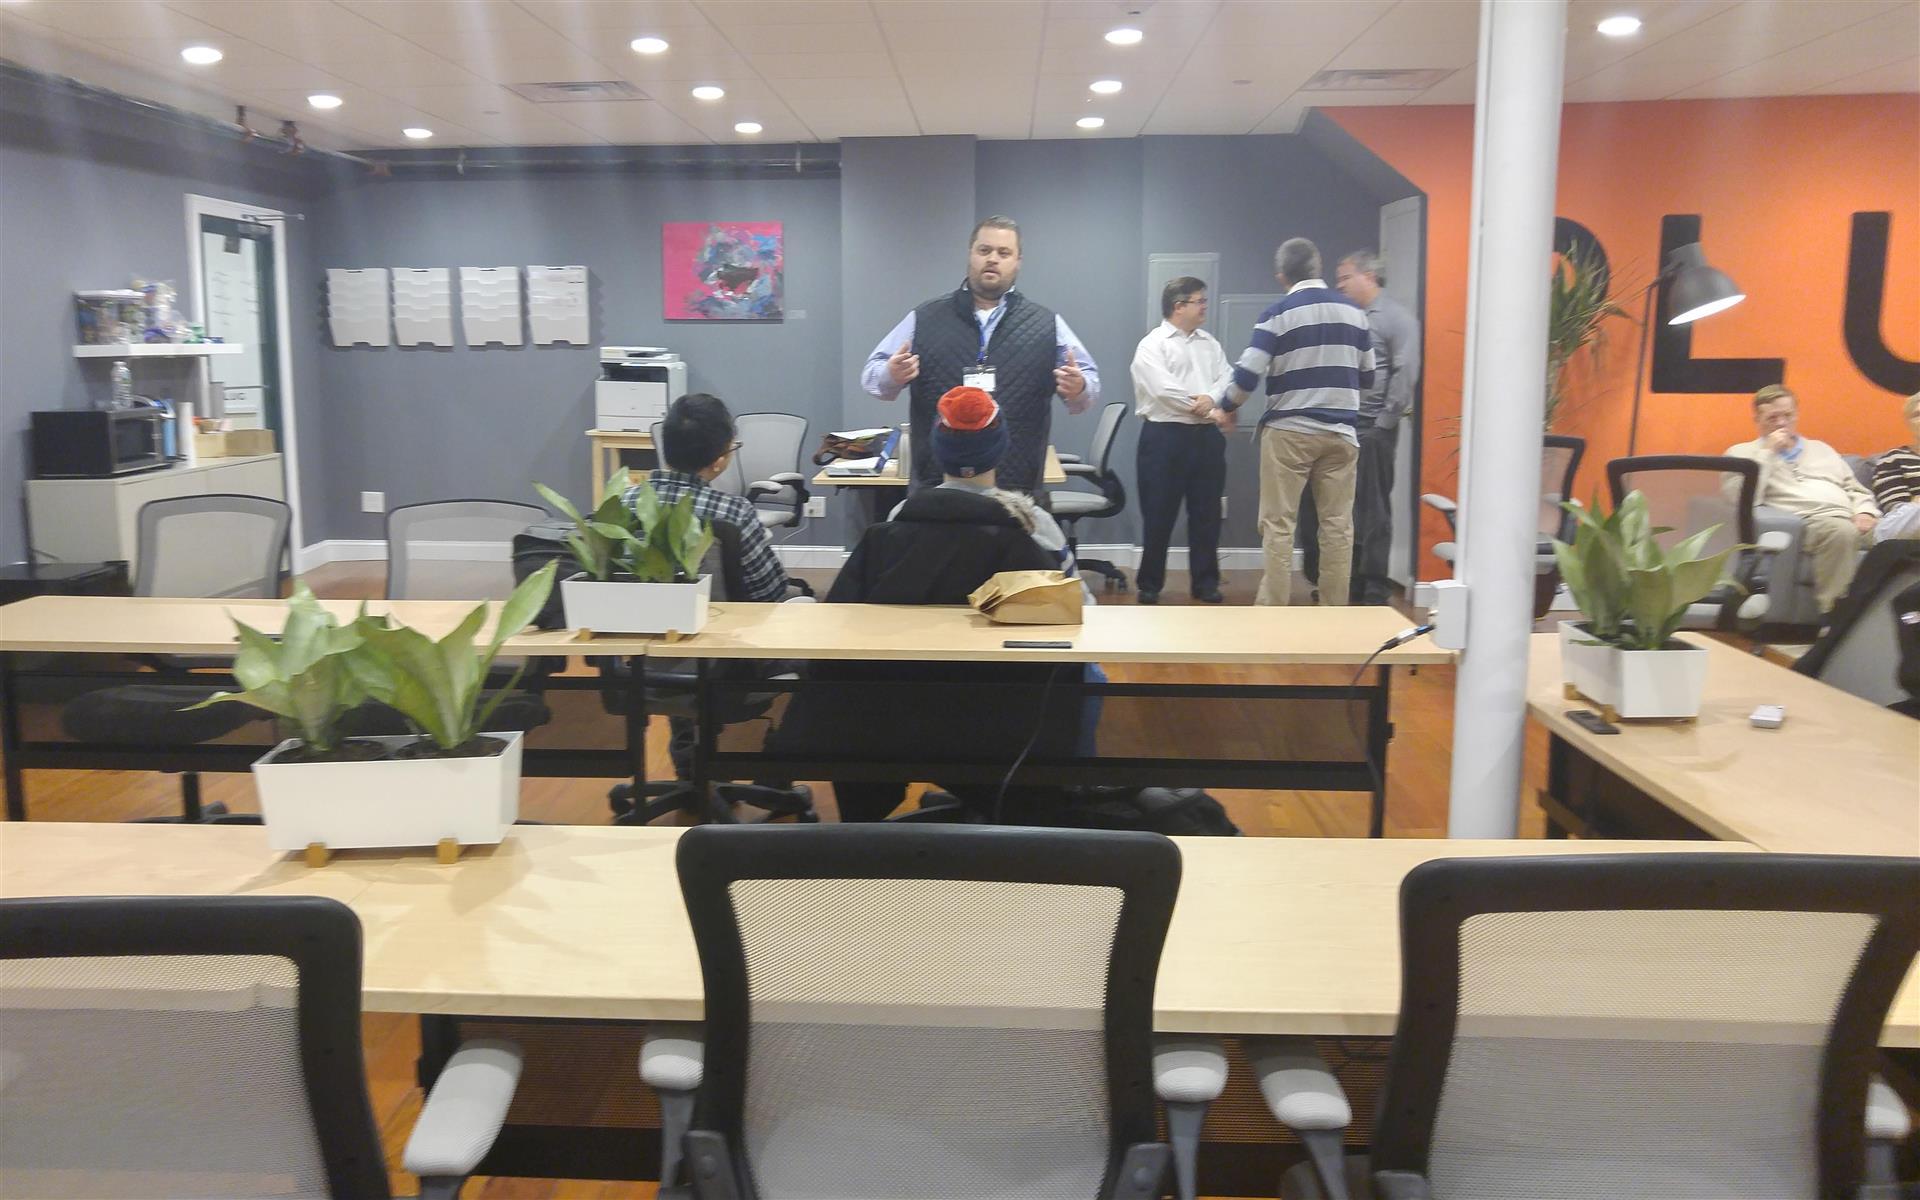 Plug Cambridge Coworking - Coworking- Open Workspace